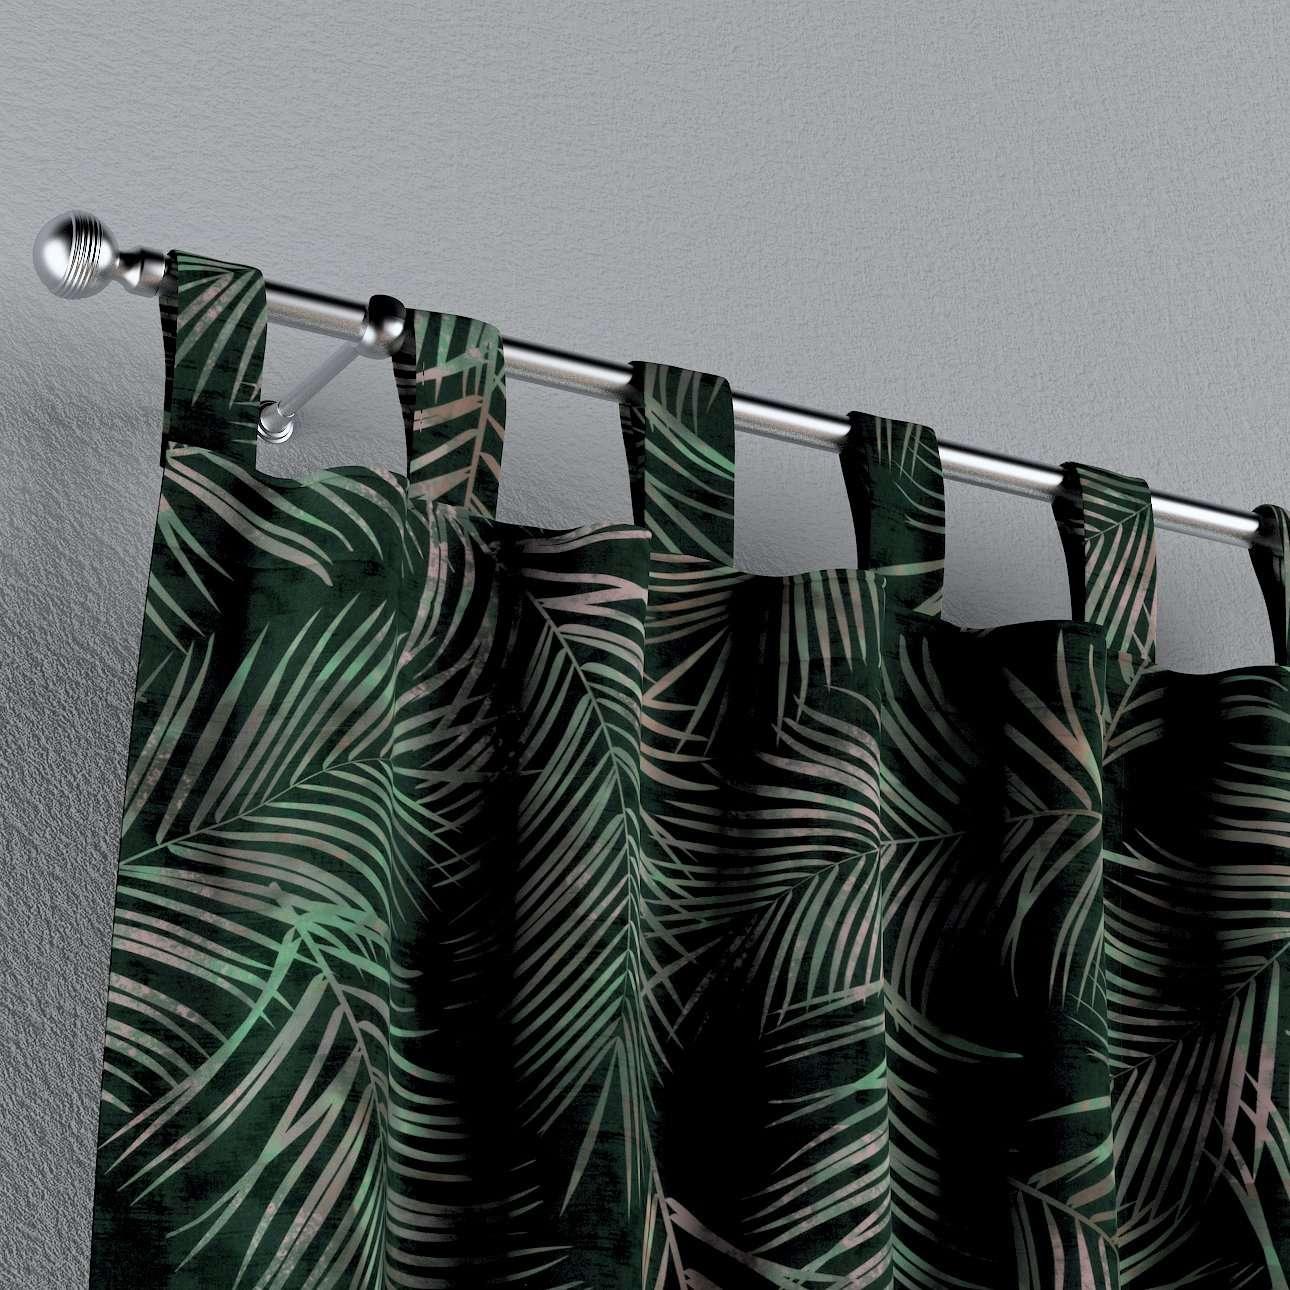 Záves na pútkach V kolekcii Velvet, tkanina: 704-21